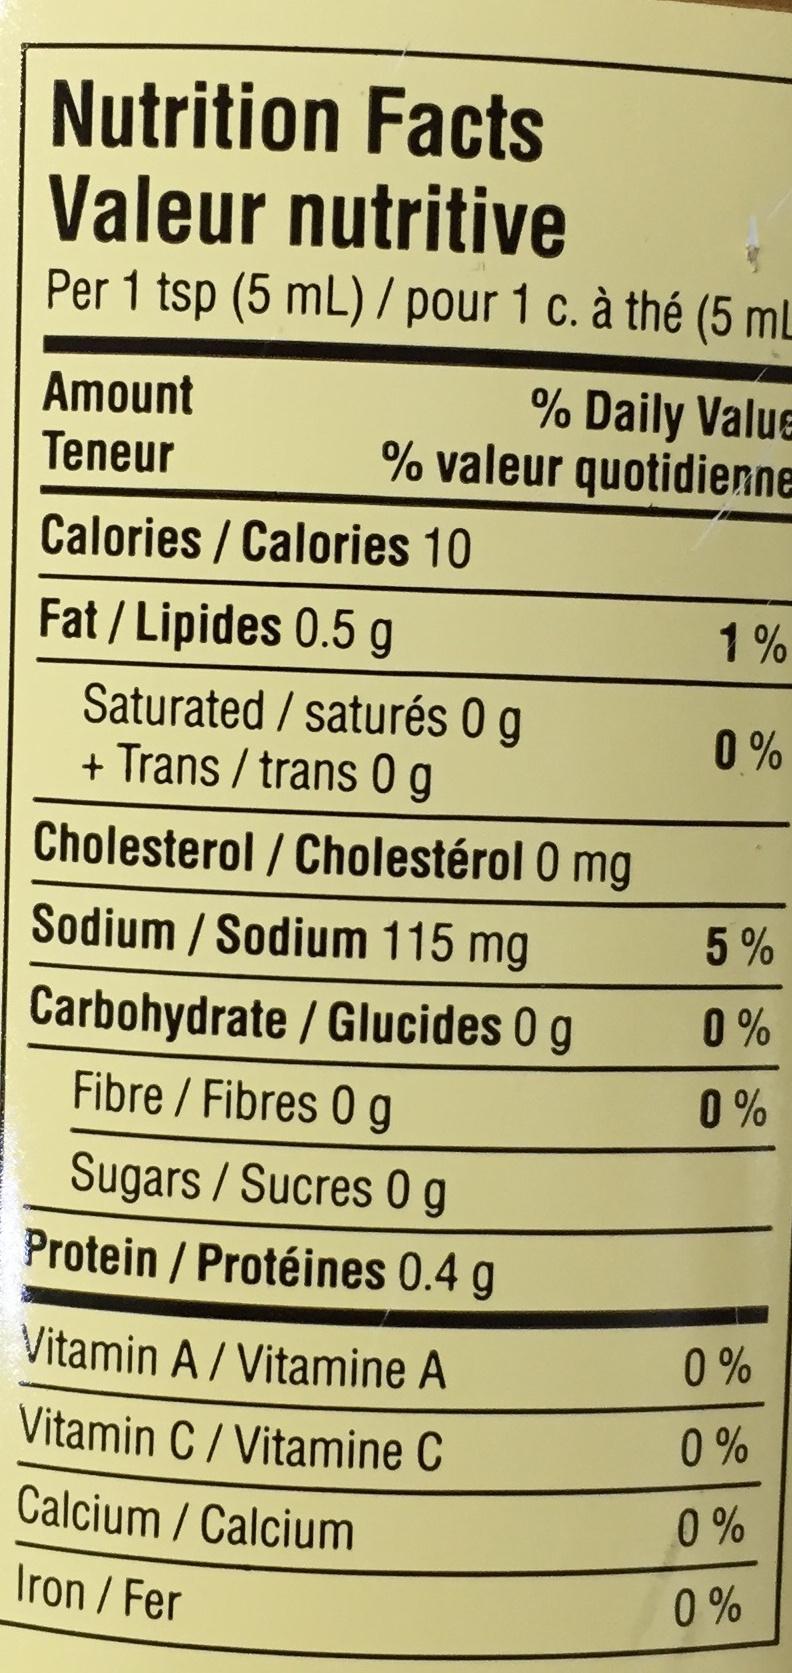 Dijon Originale - Nutrition facts - fr